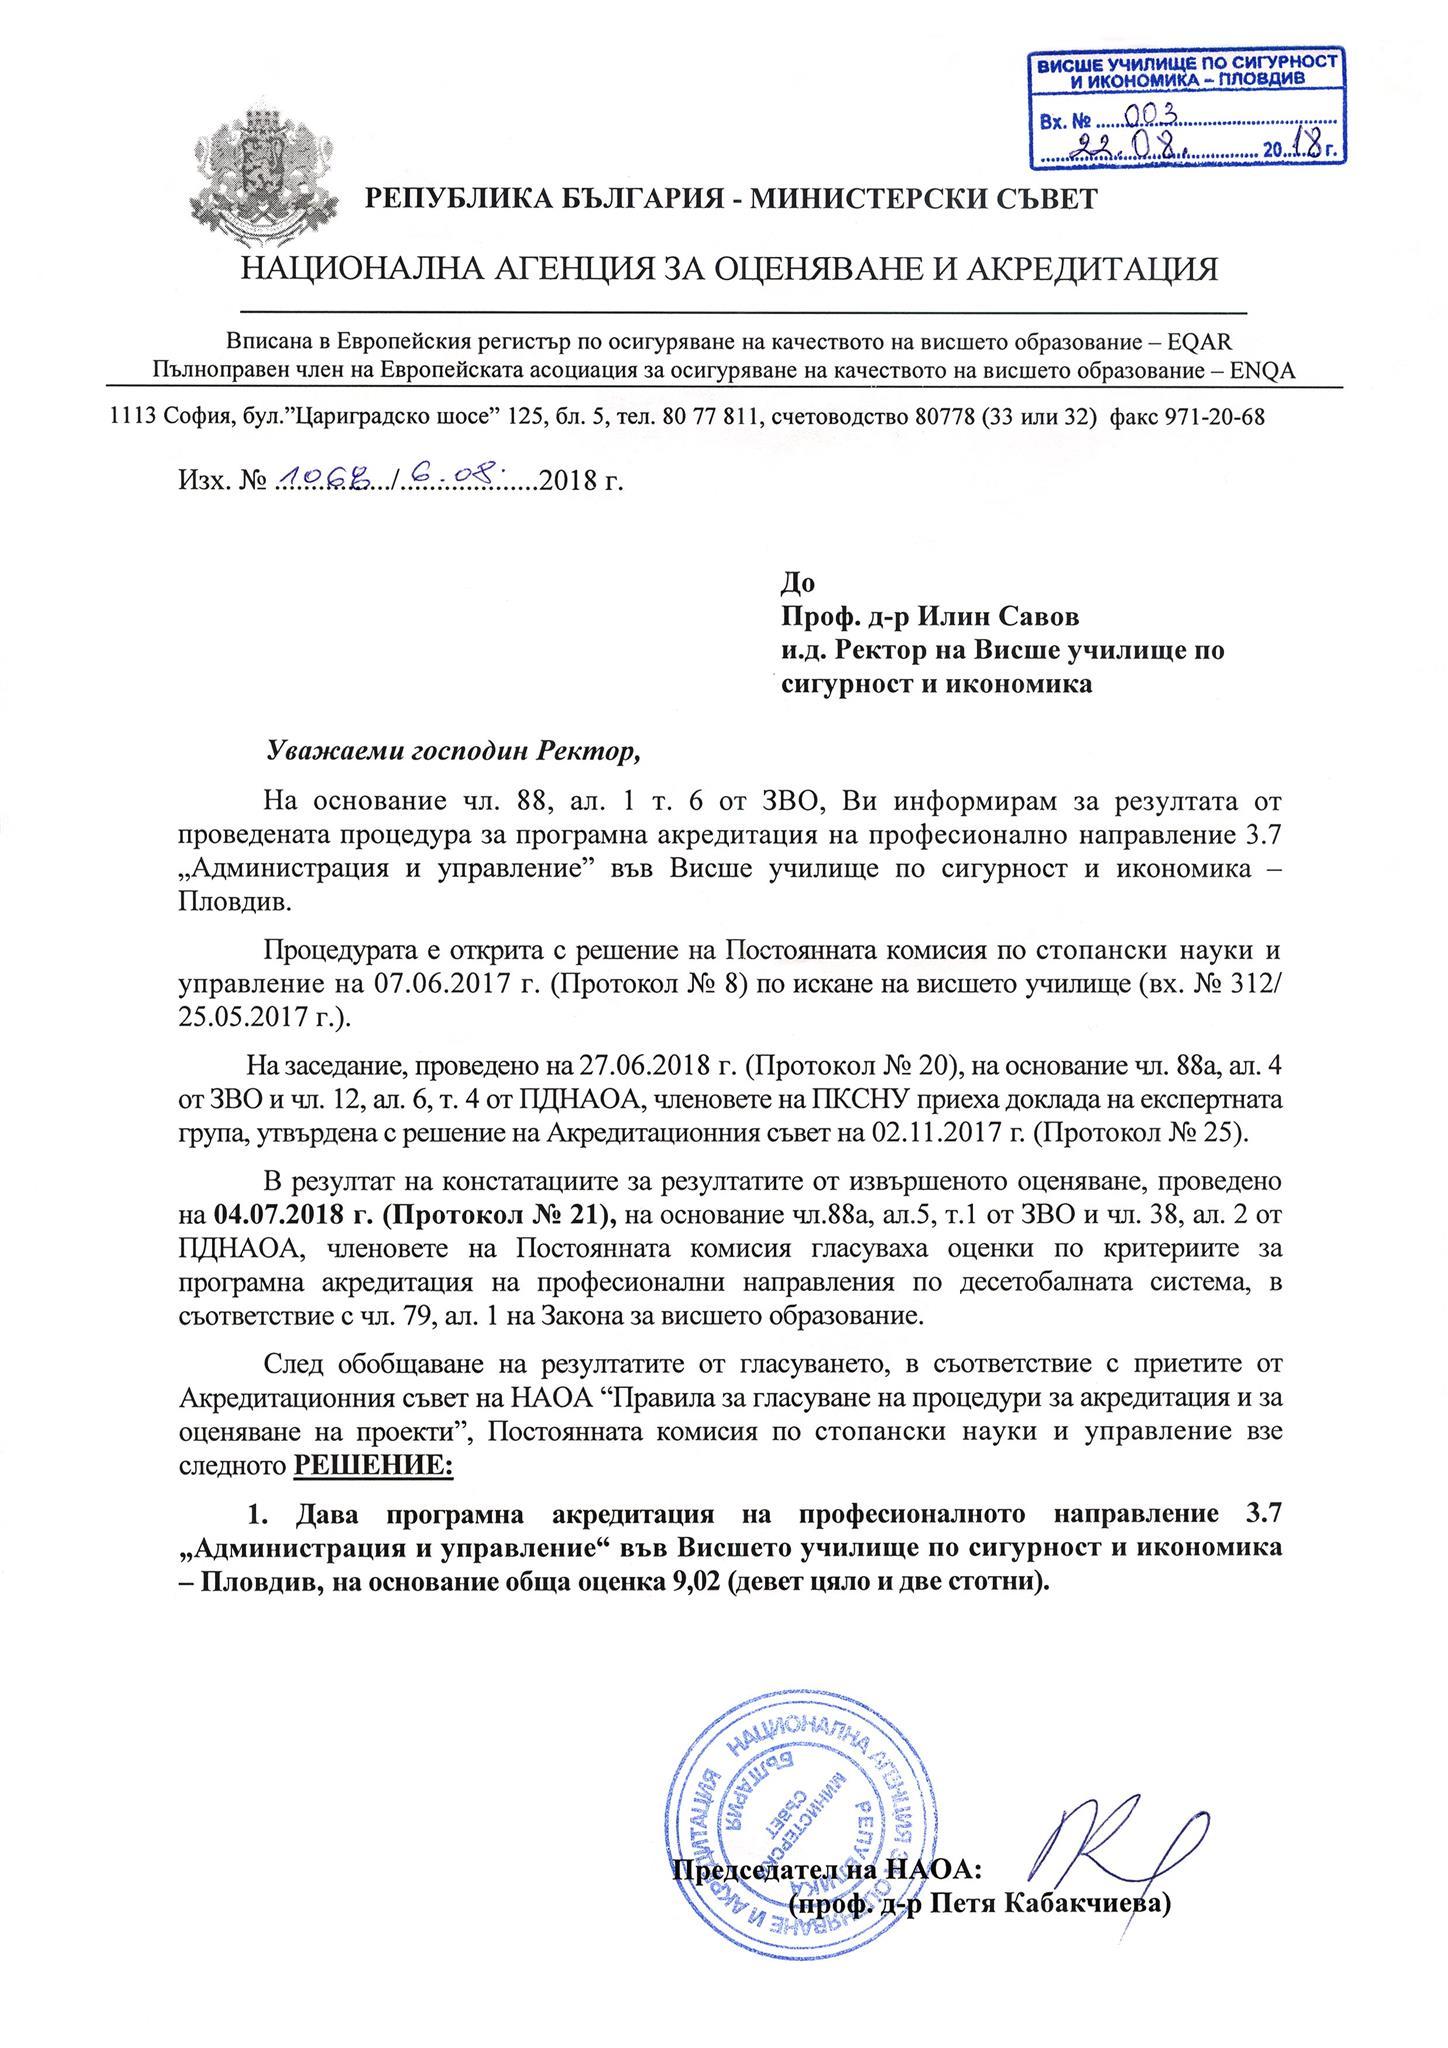 Акредитация - Администрация и управление